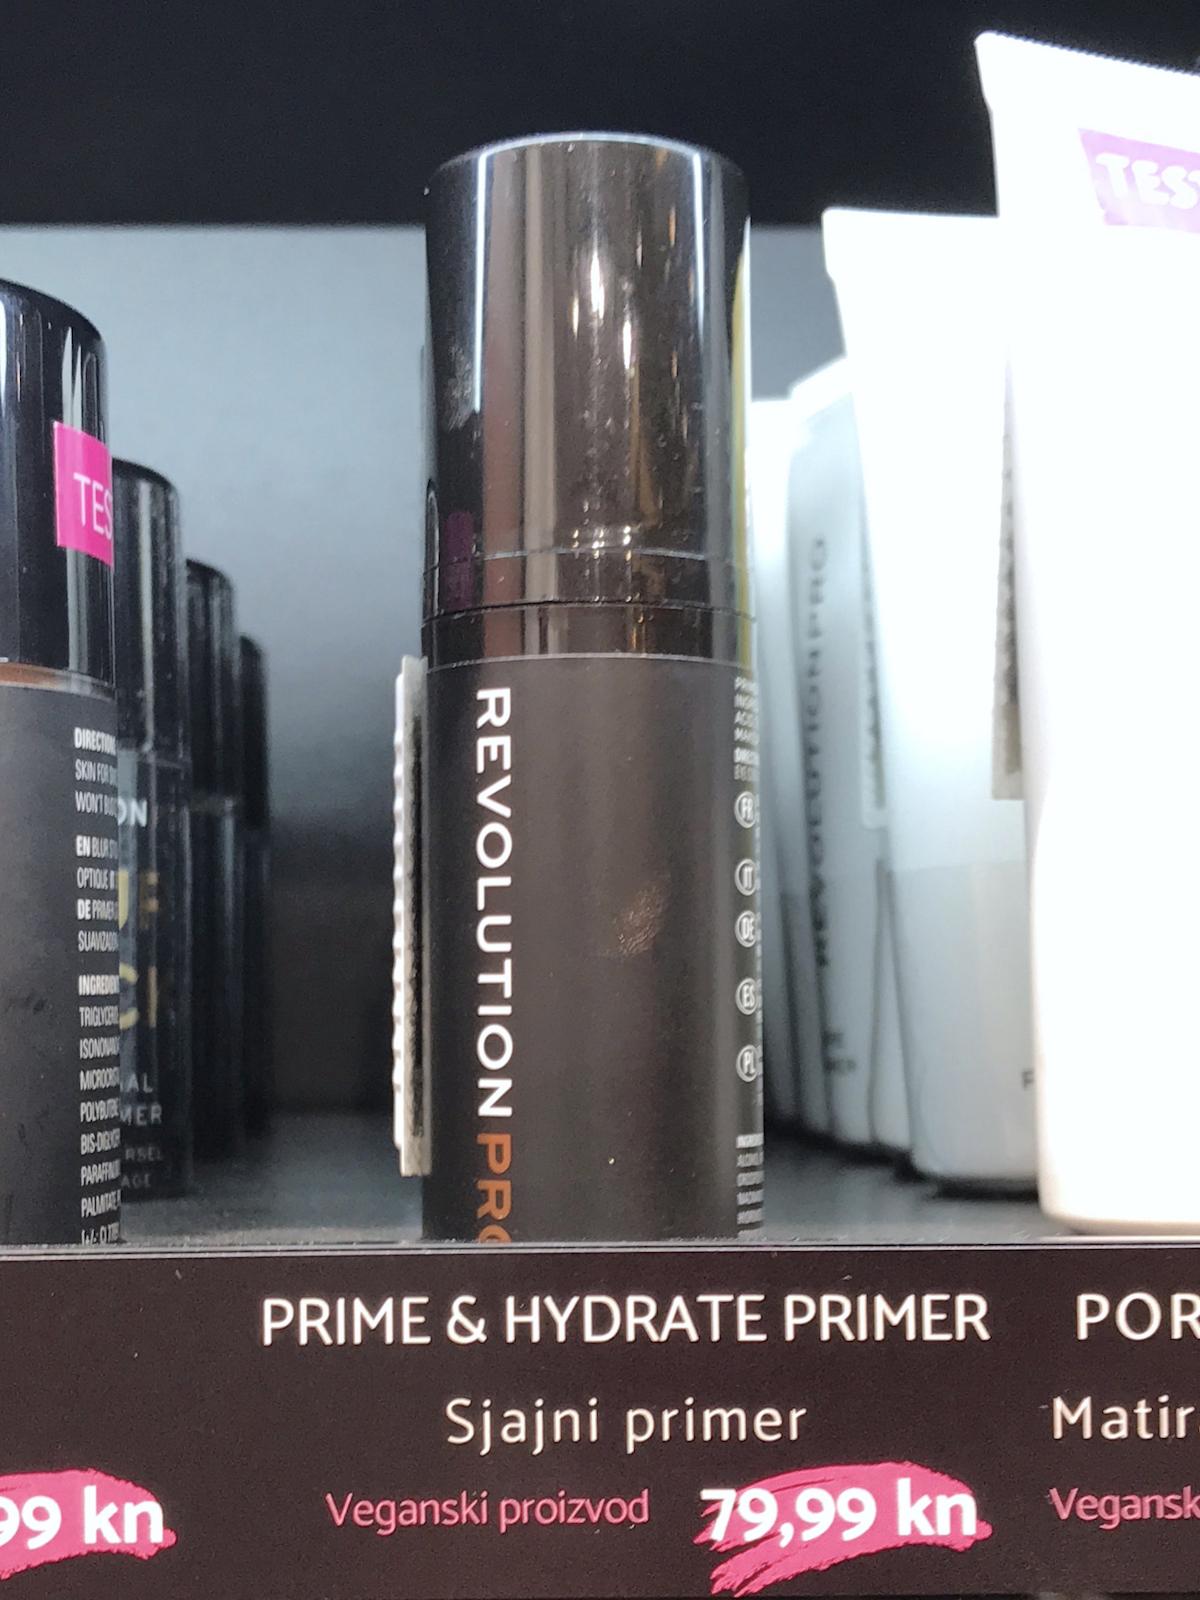 Pink Panda licila Lana spital beautyfull blog Revolution Pro Prime & Hydrate Primer